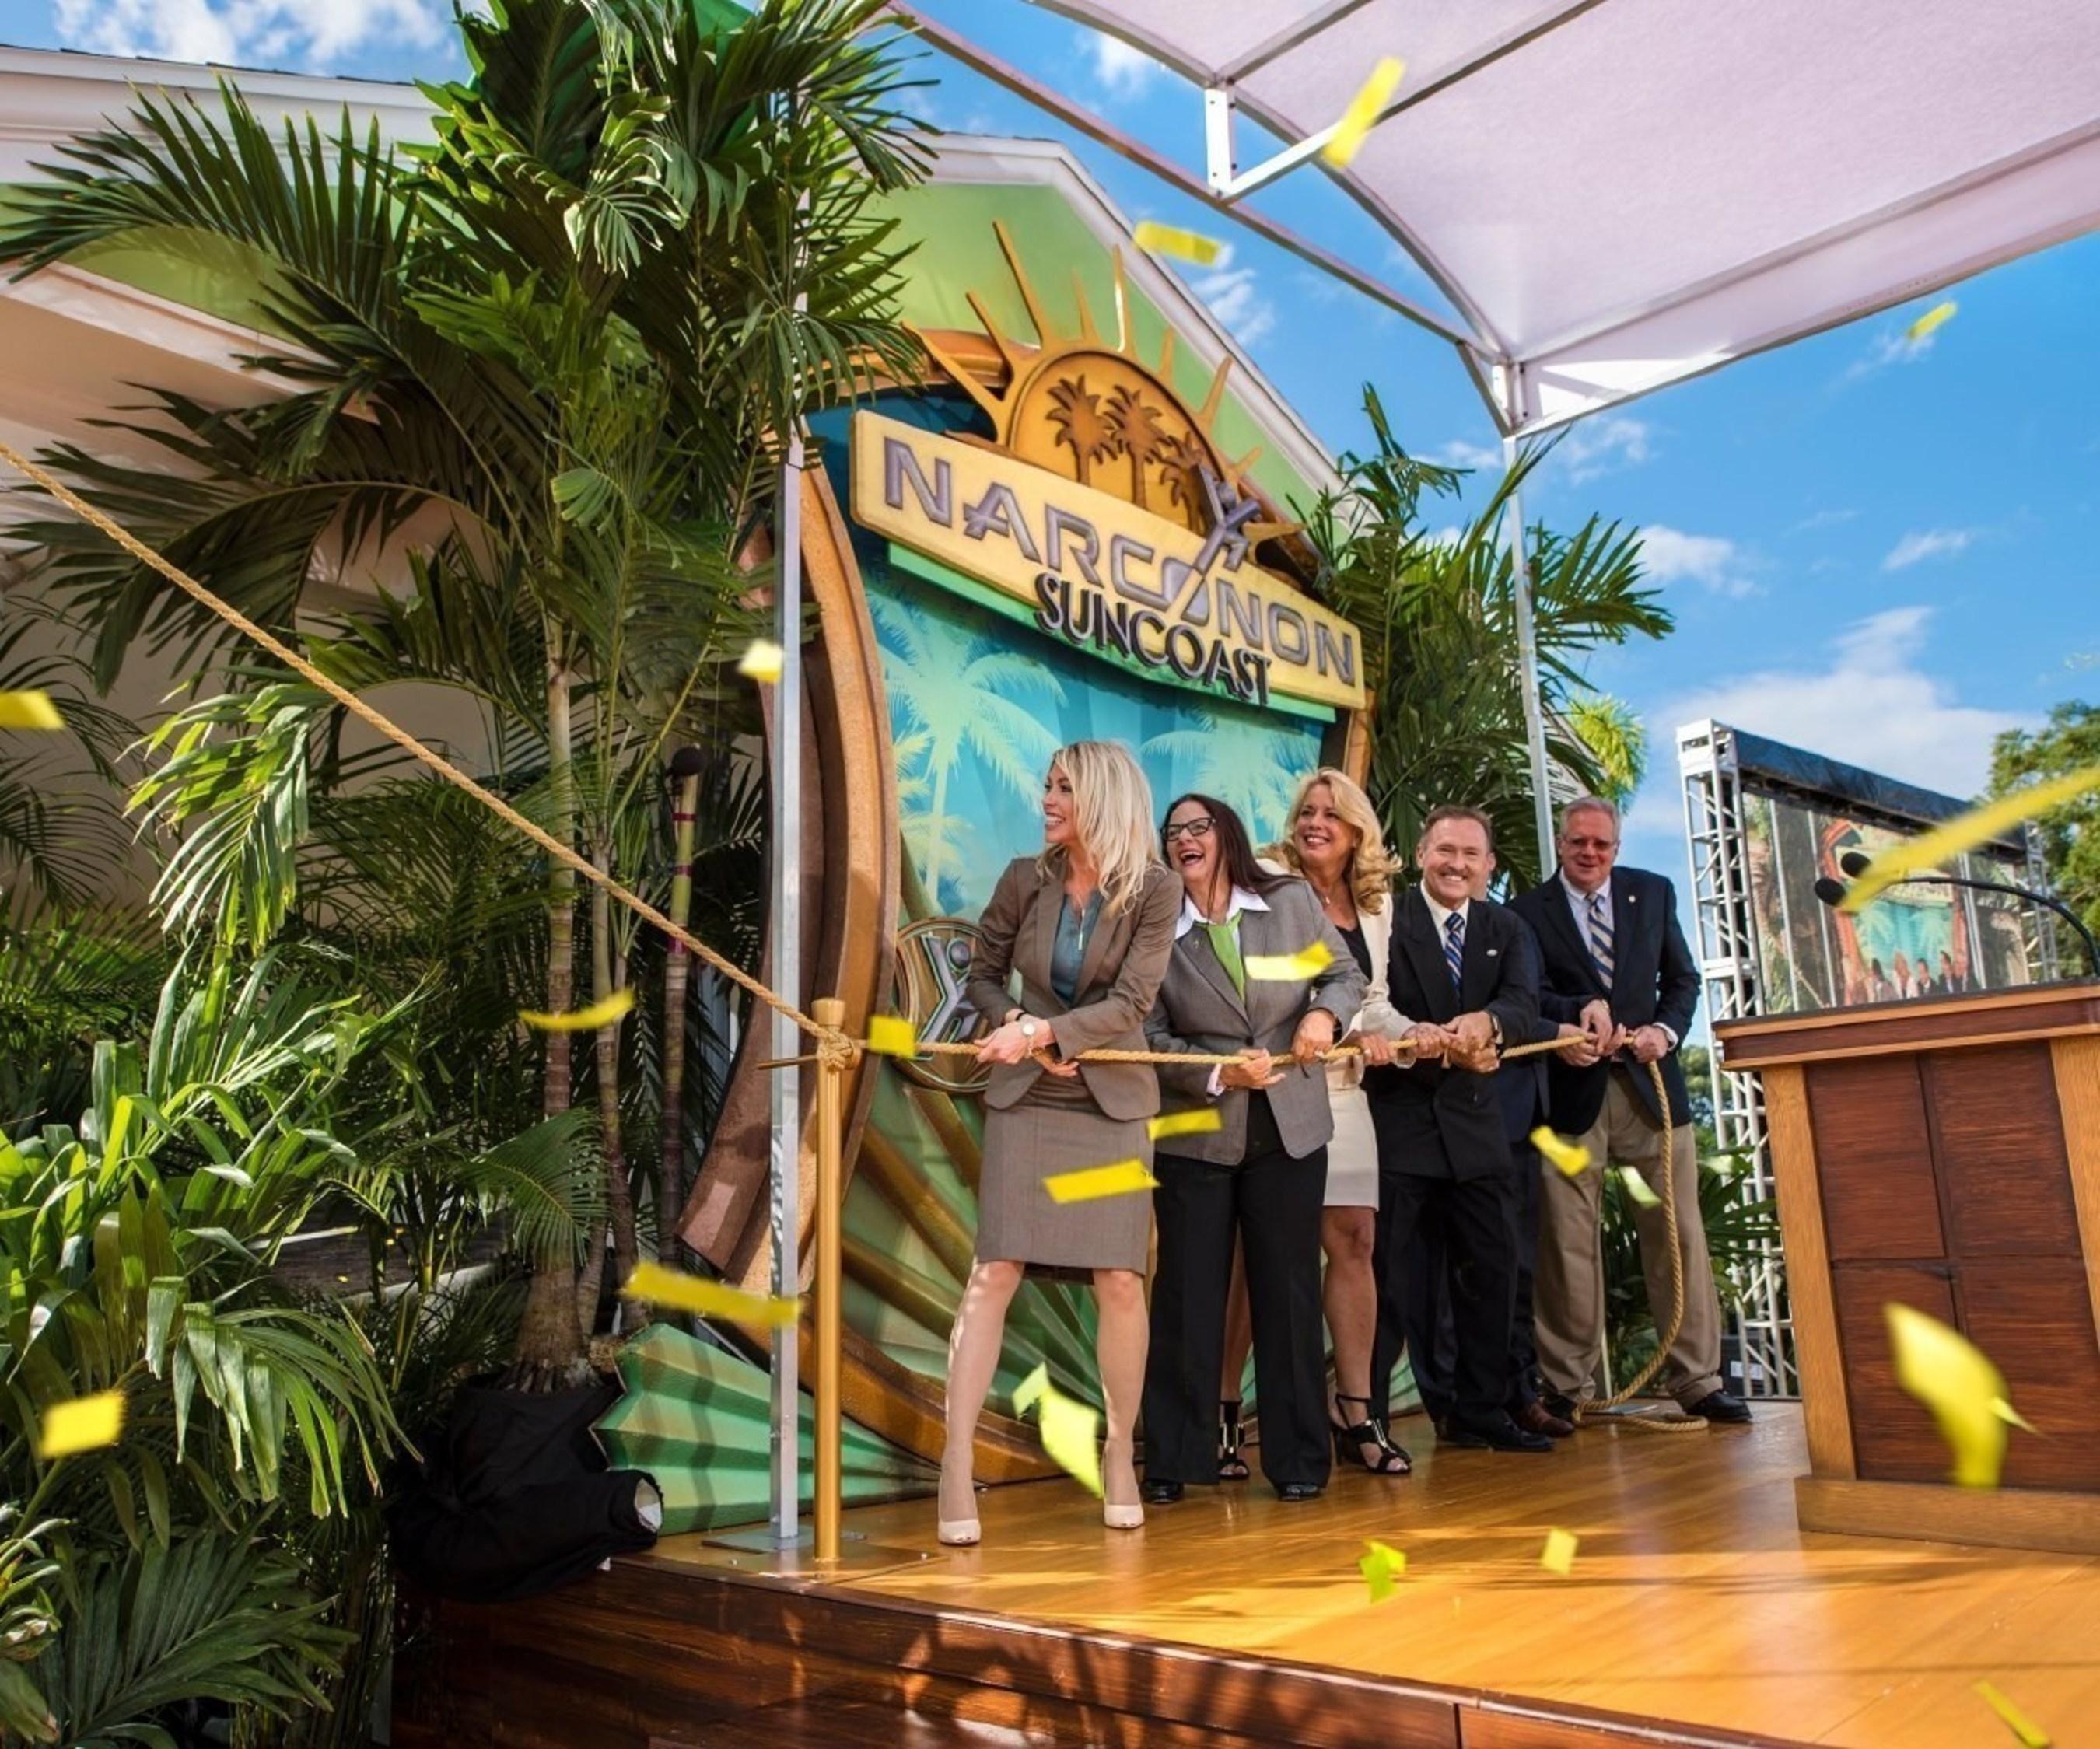 Narconon Suncoast Dedication Heralds Dynamic New Age for Drug Rehab in Florida